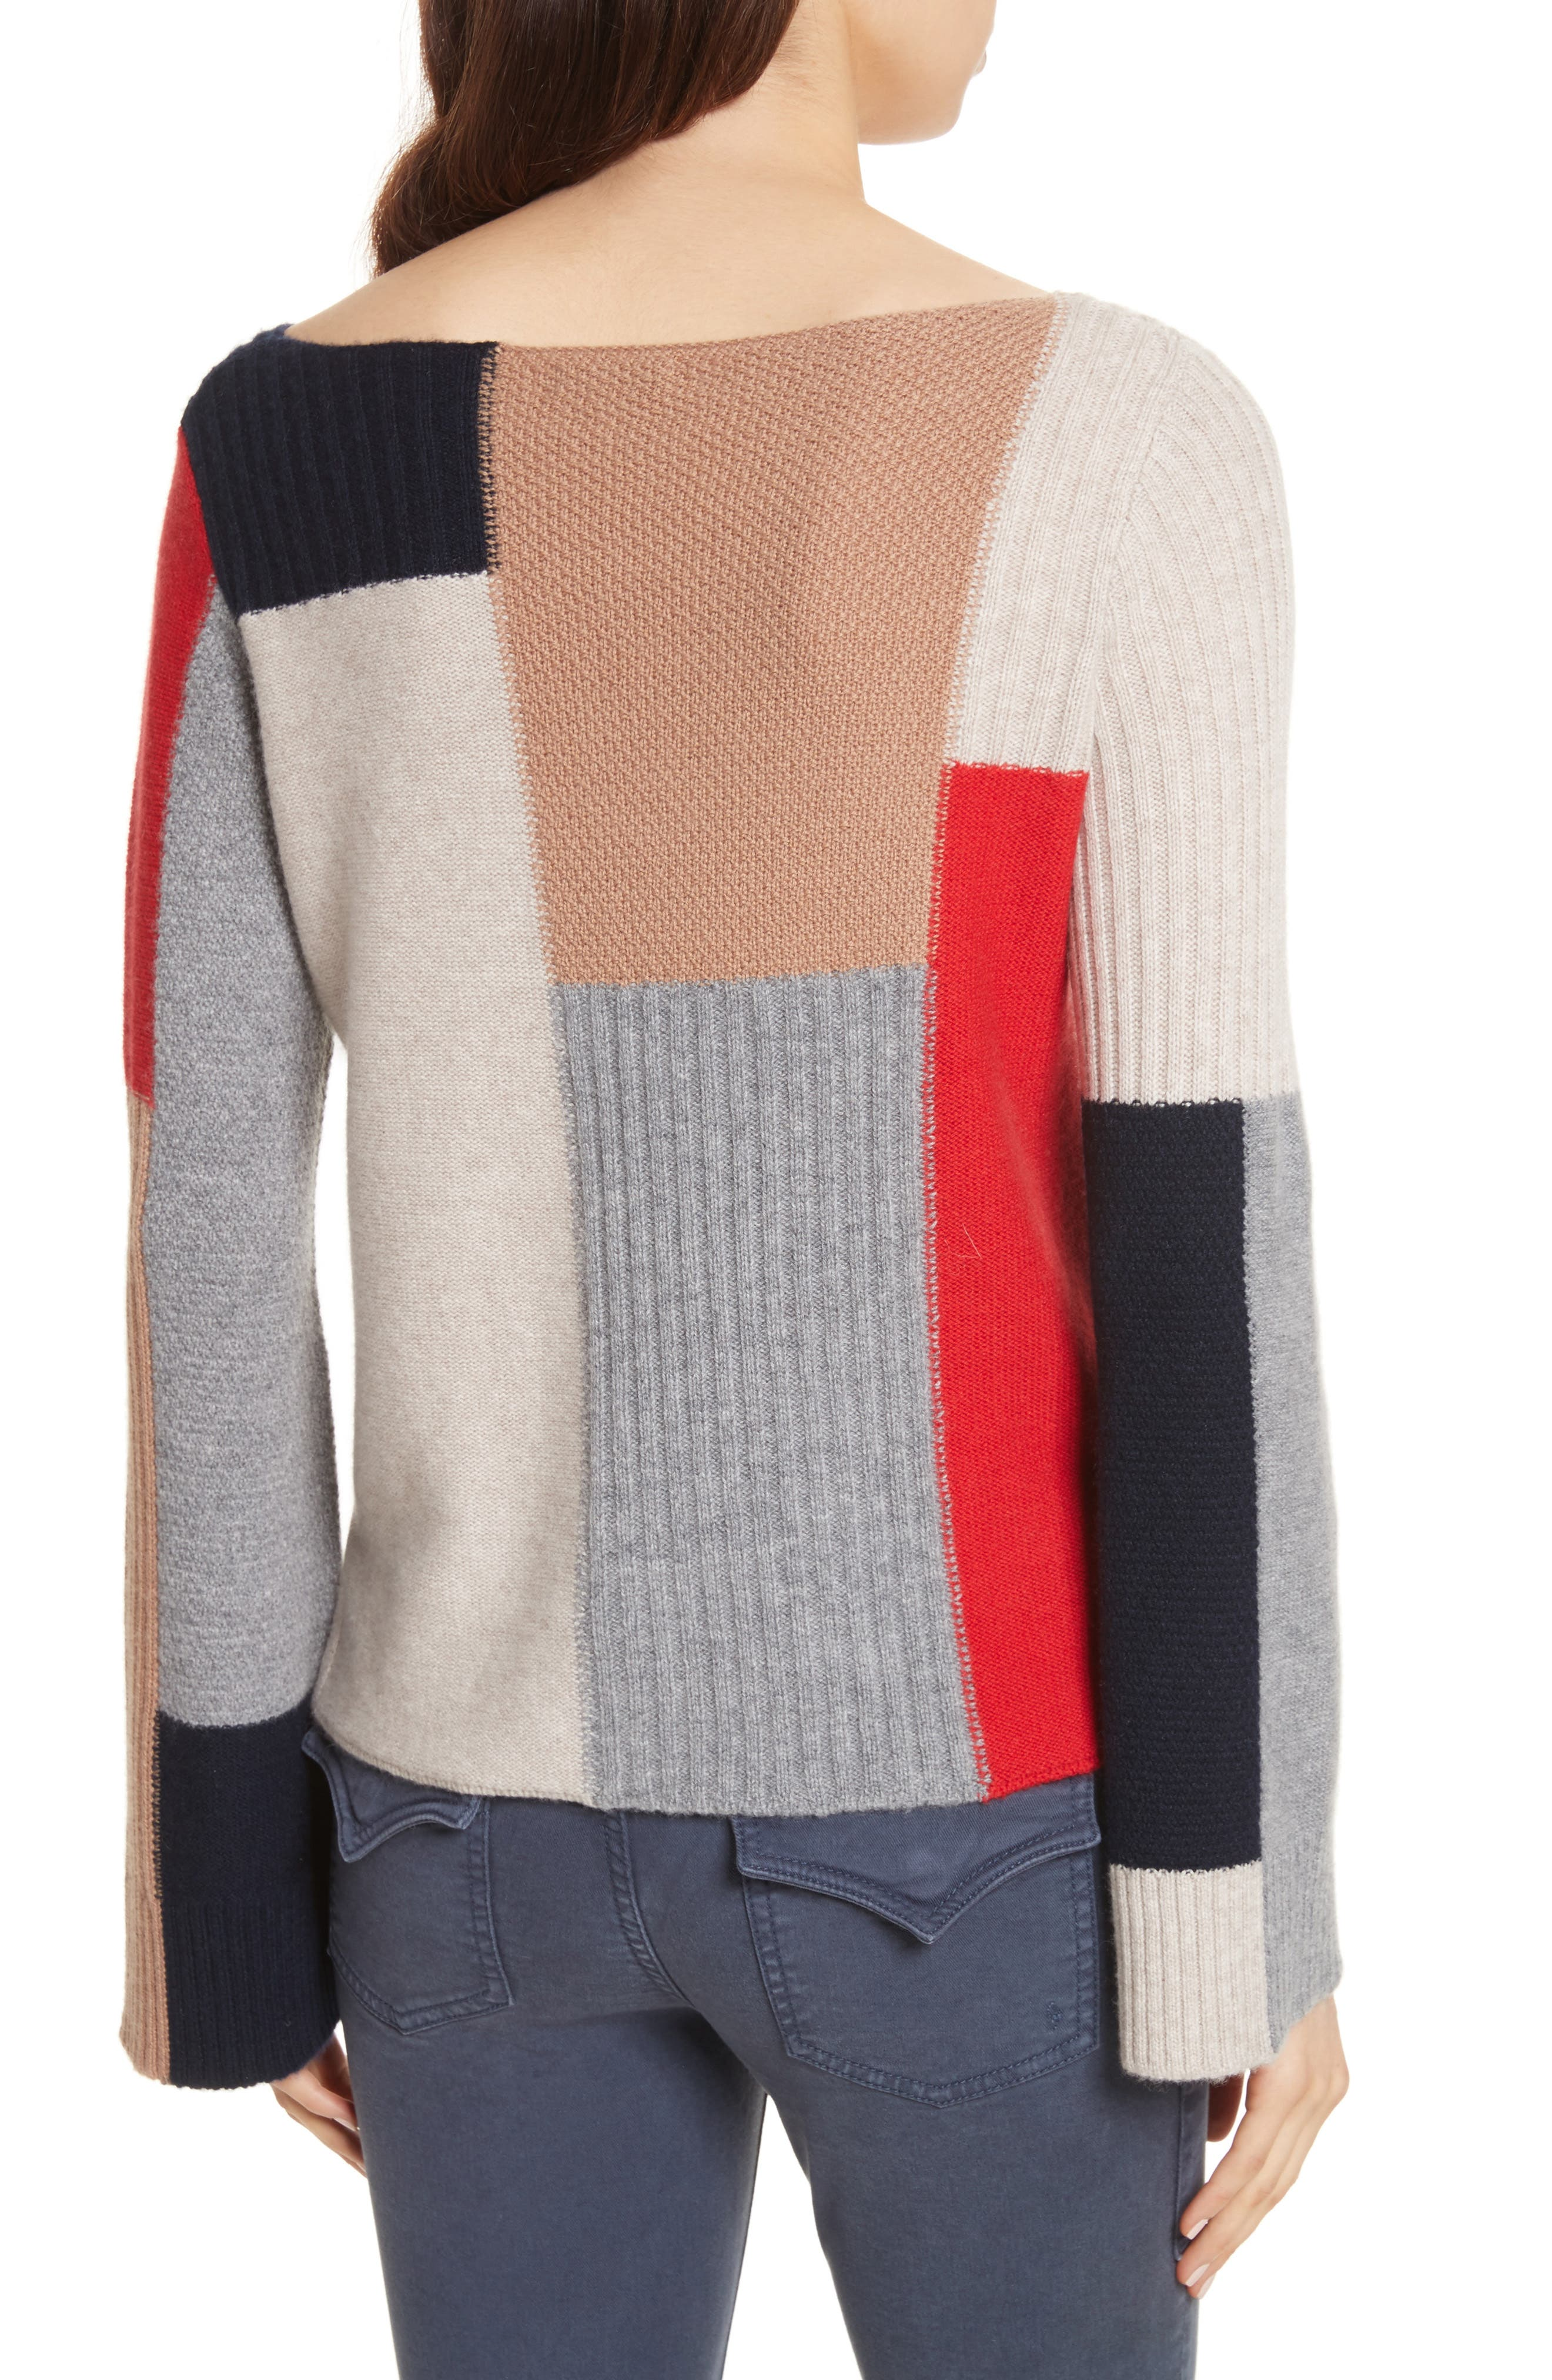 Adene Wool & Cashmere Sweater,                             Alternate thumbnail 2, color,                             641